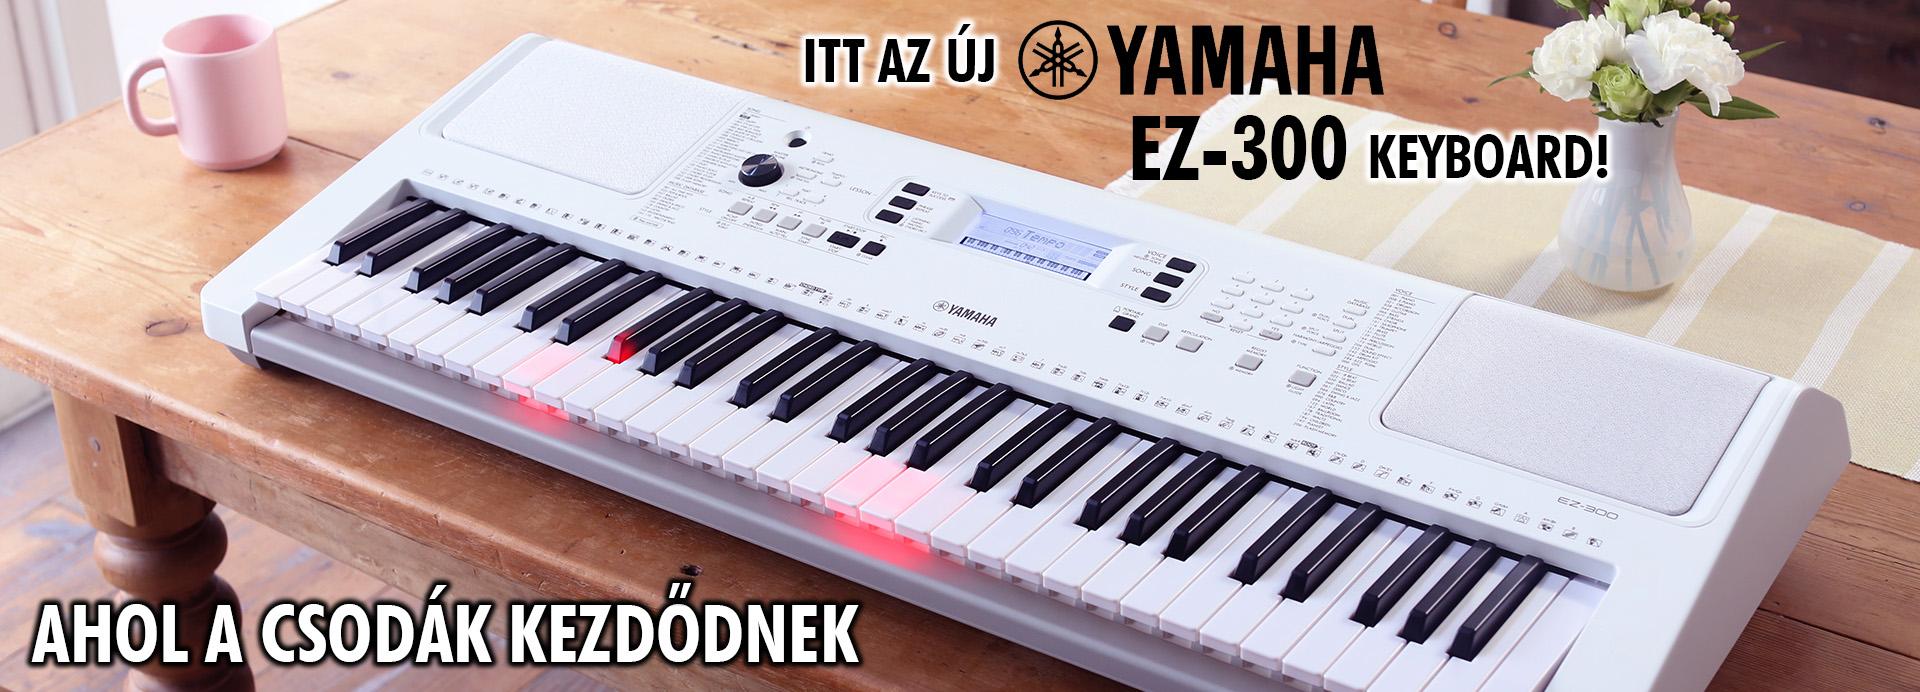 YAMAHA EZ-300 KEYBOARD